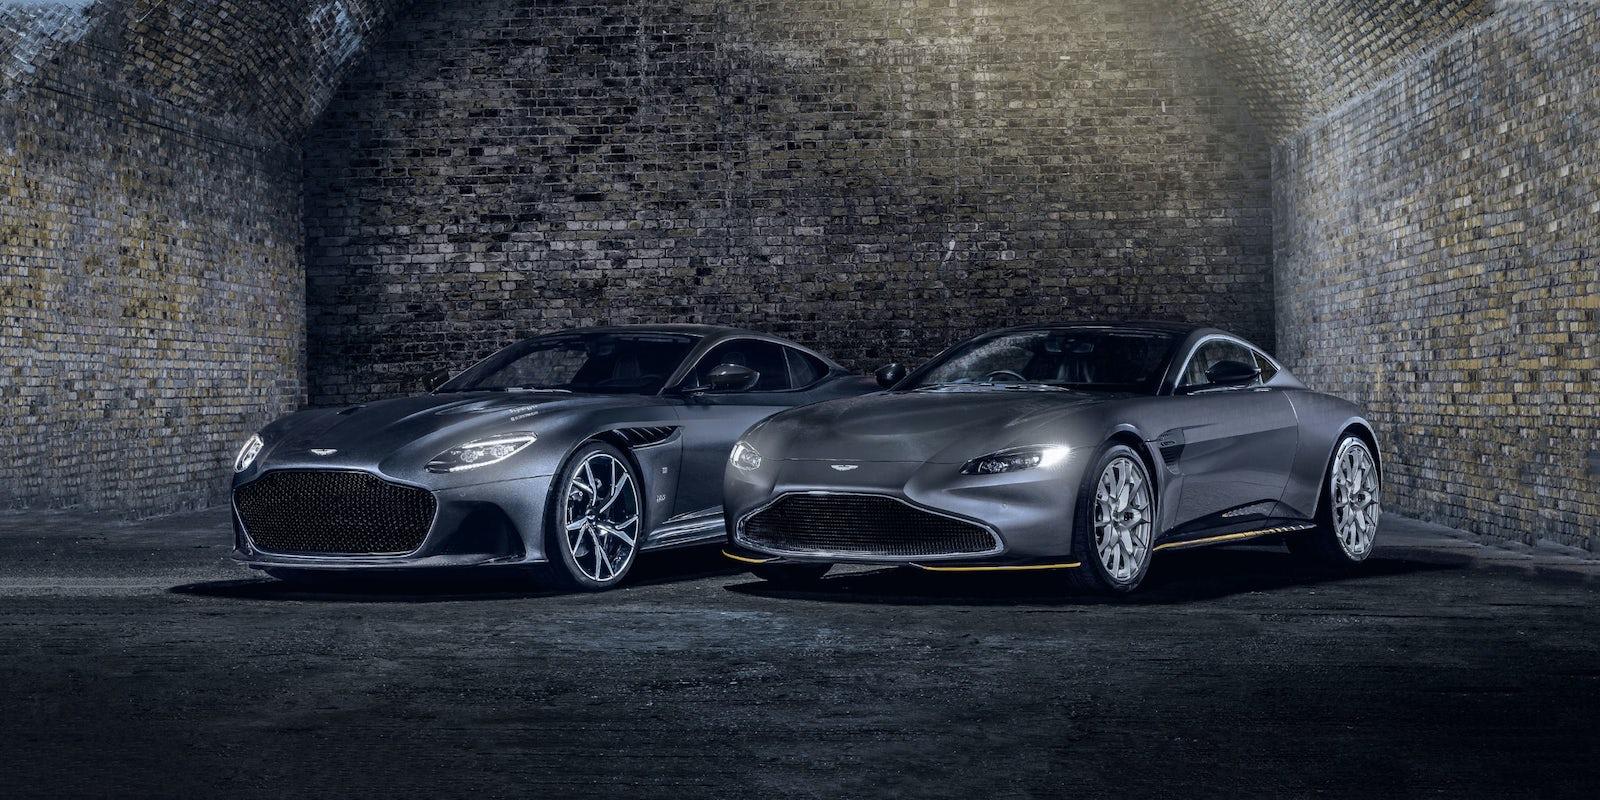 007 Edition Aston Martin V8 Vantage And Dbs Superleggera Revealed Carwow